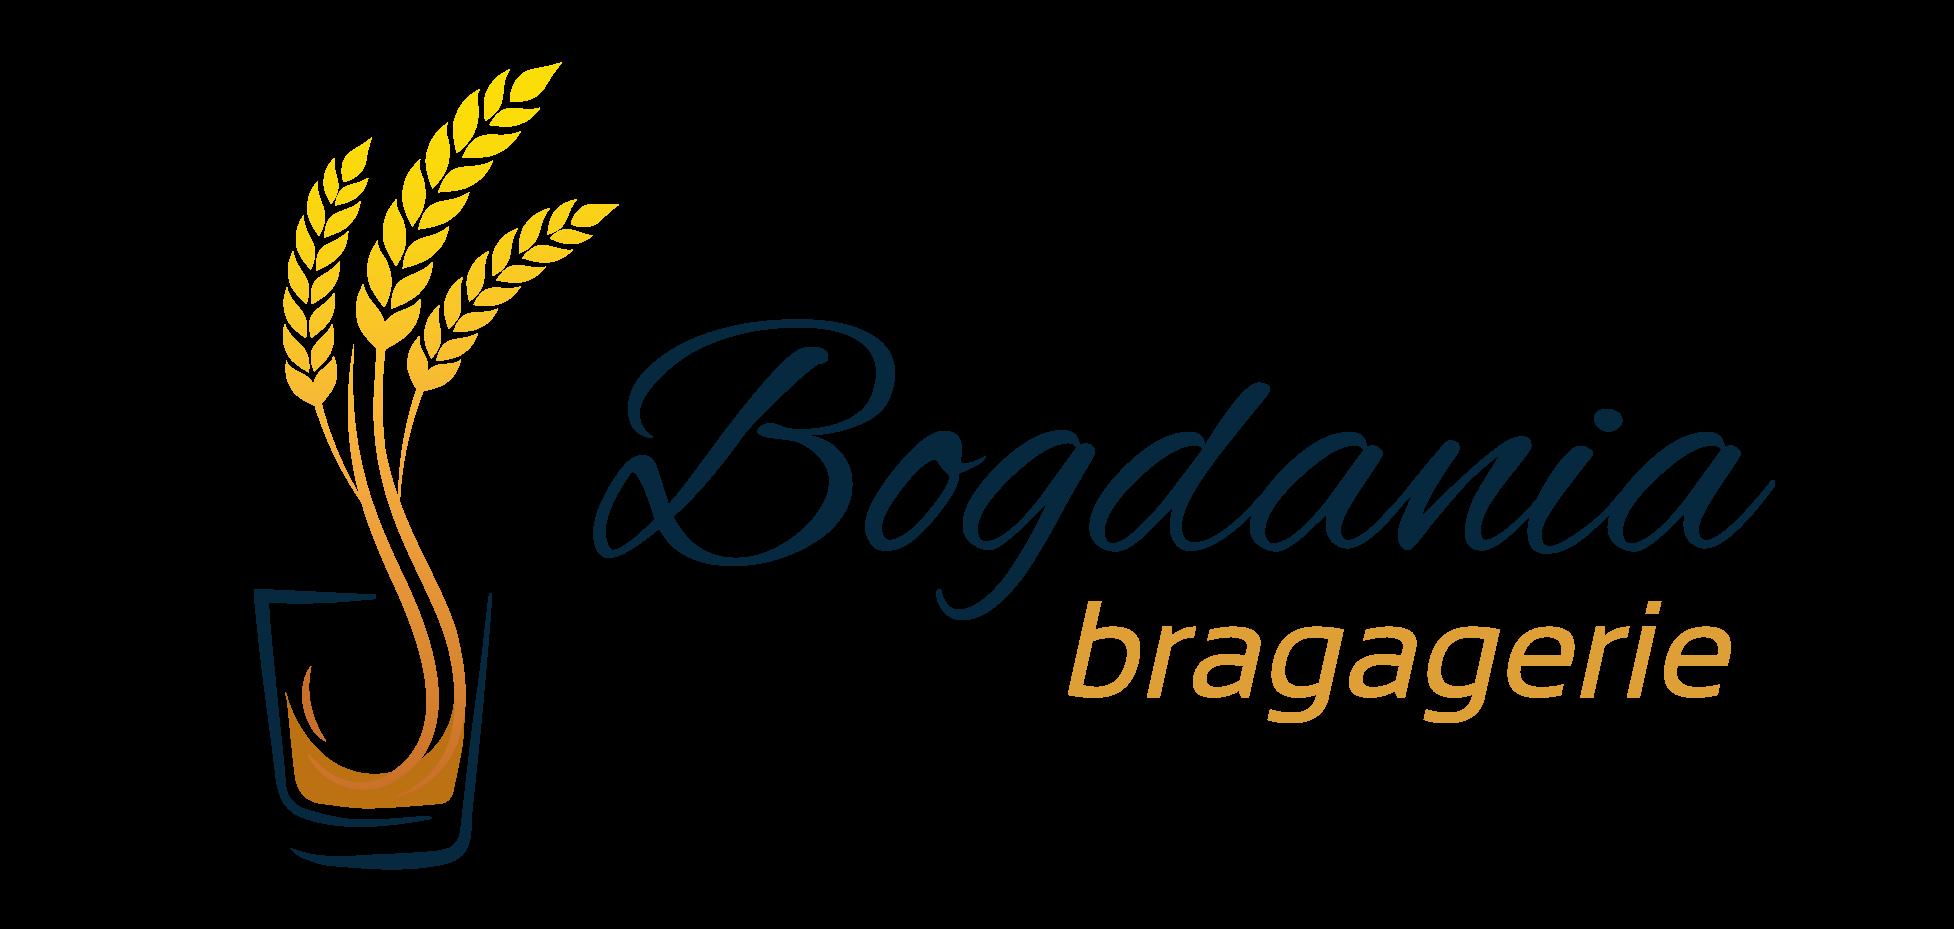 Bragageria Bogdania